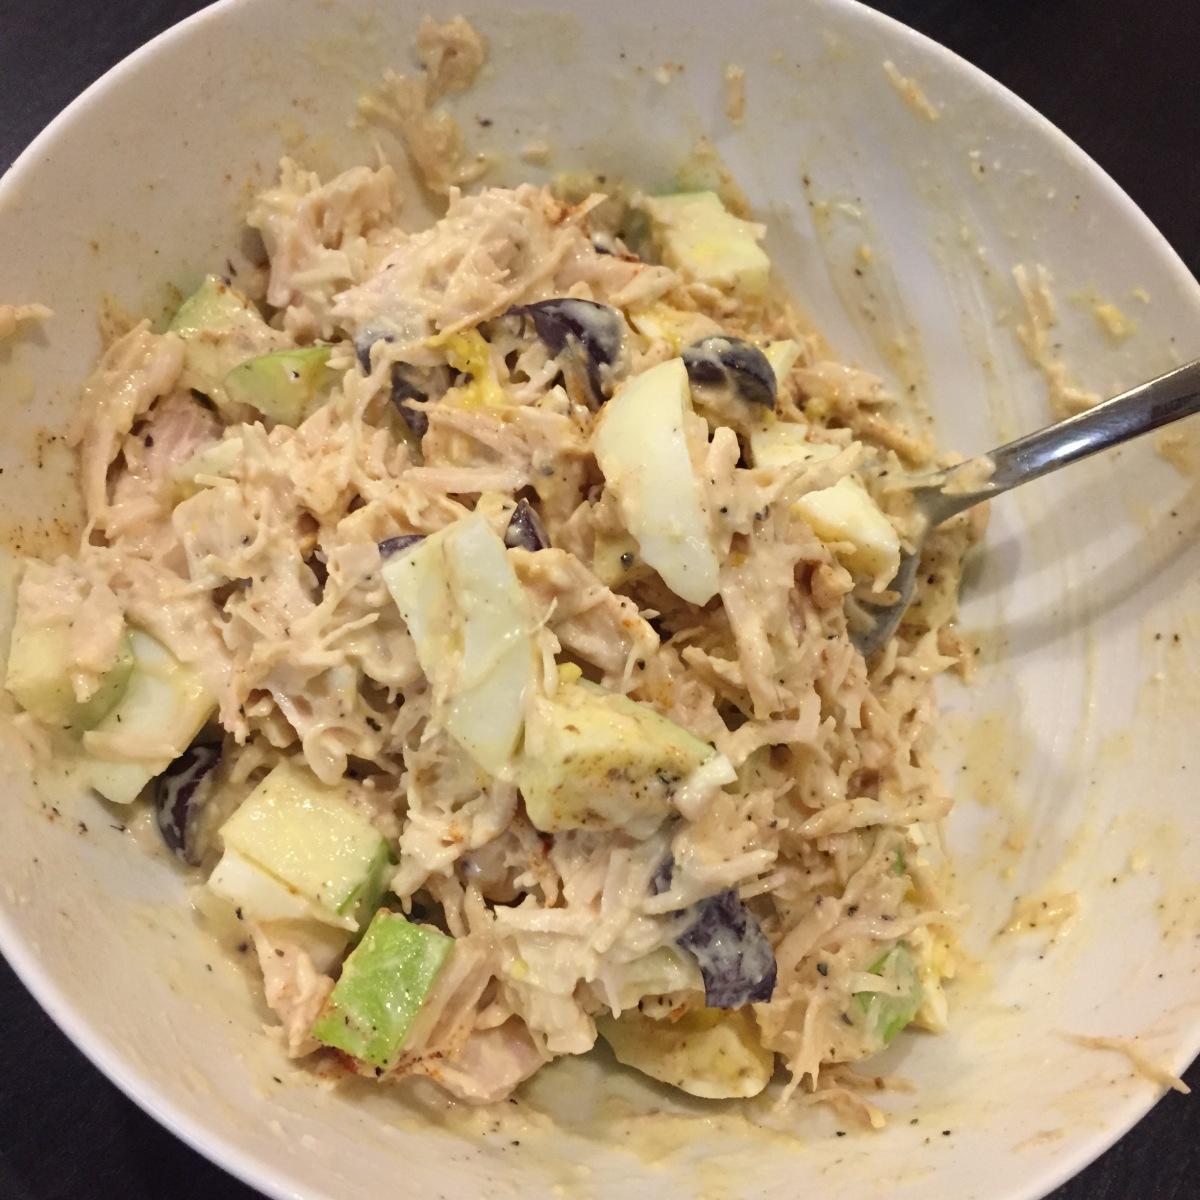 Chicken Salad, the Mayo Kind